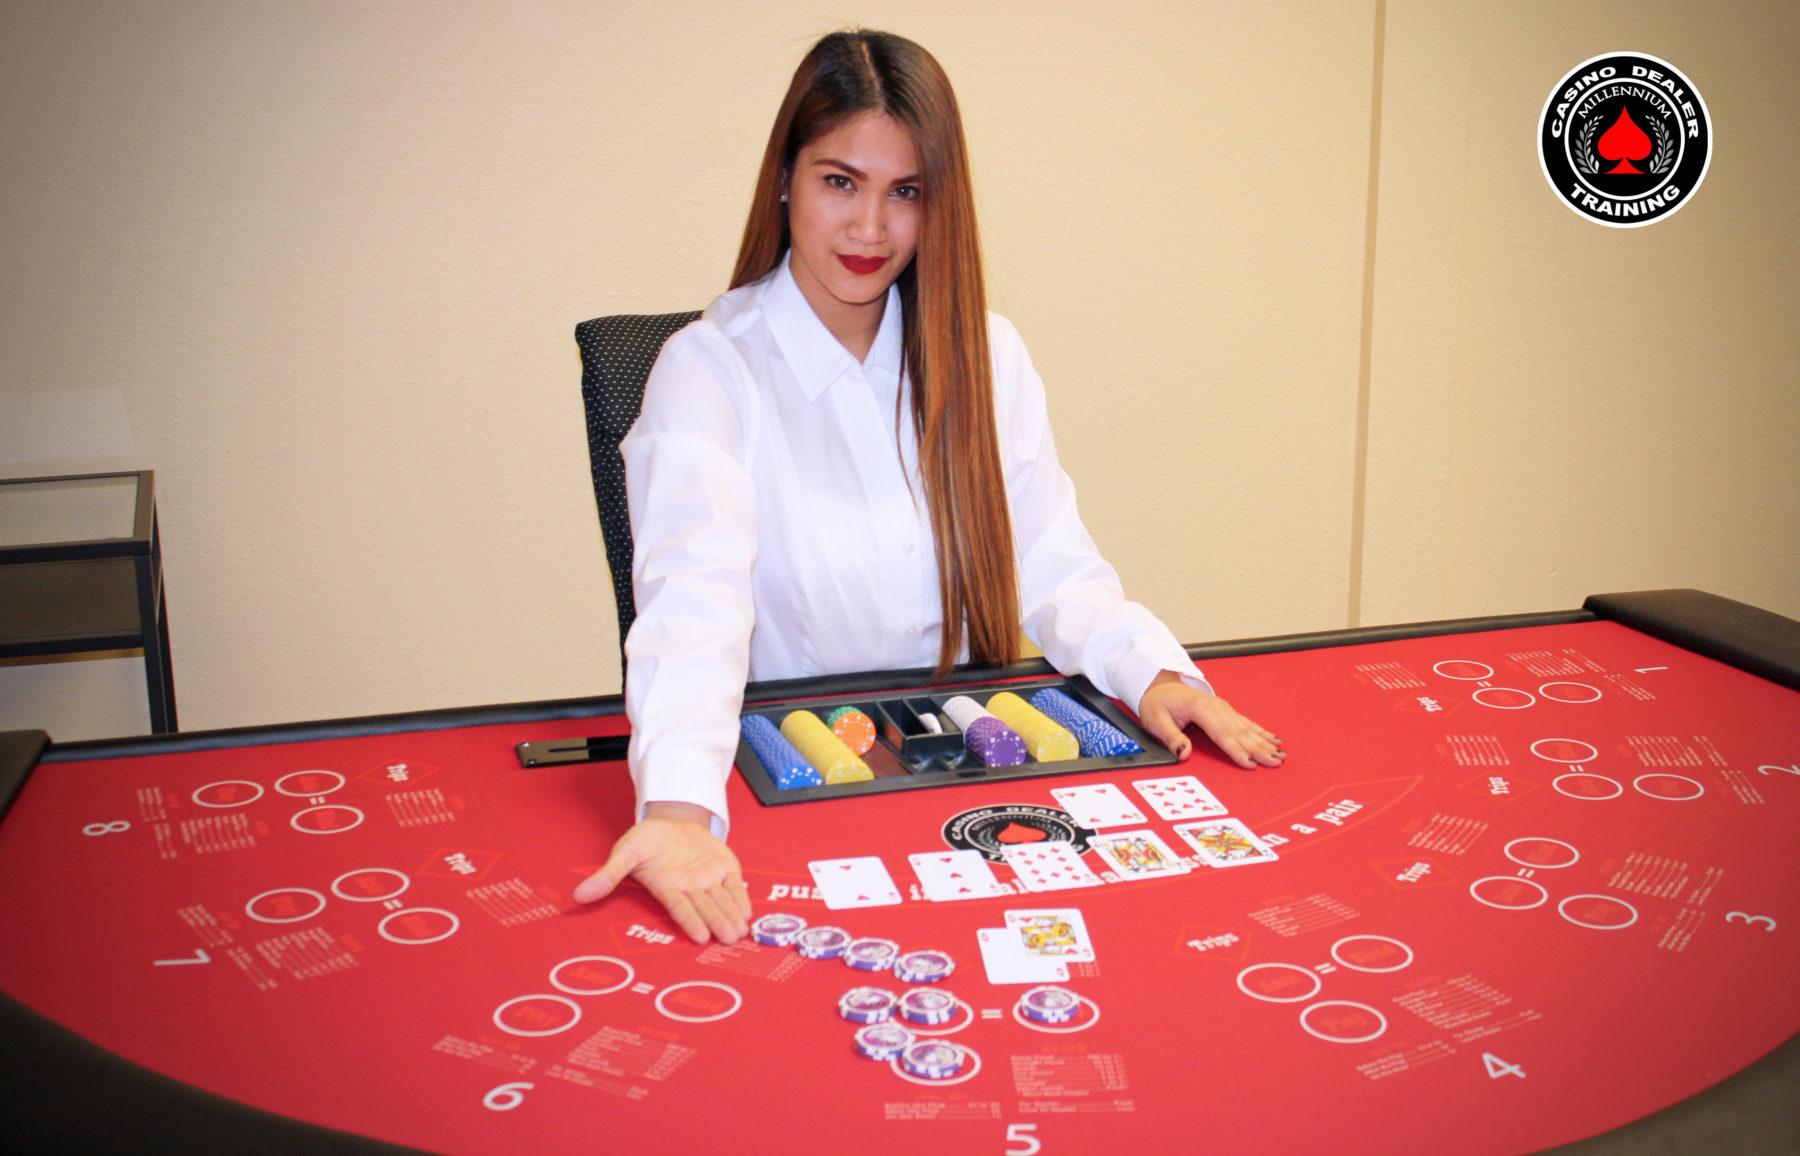 Casino dealer academy manila hotel casino